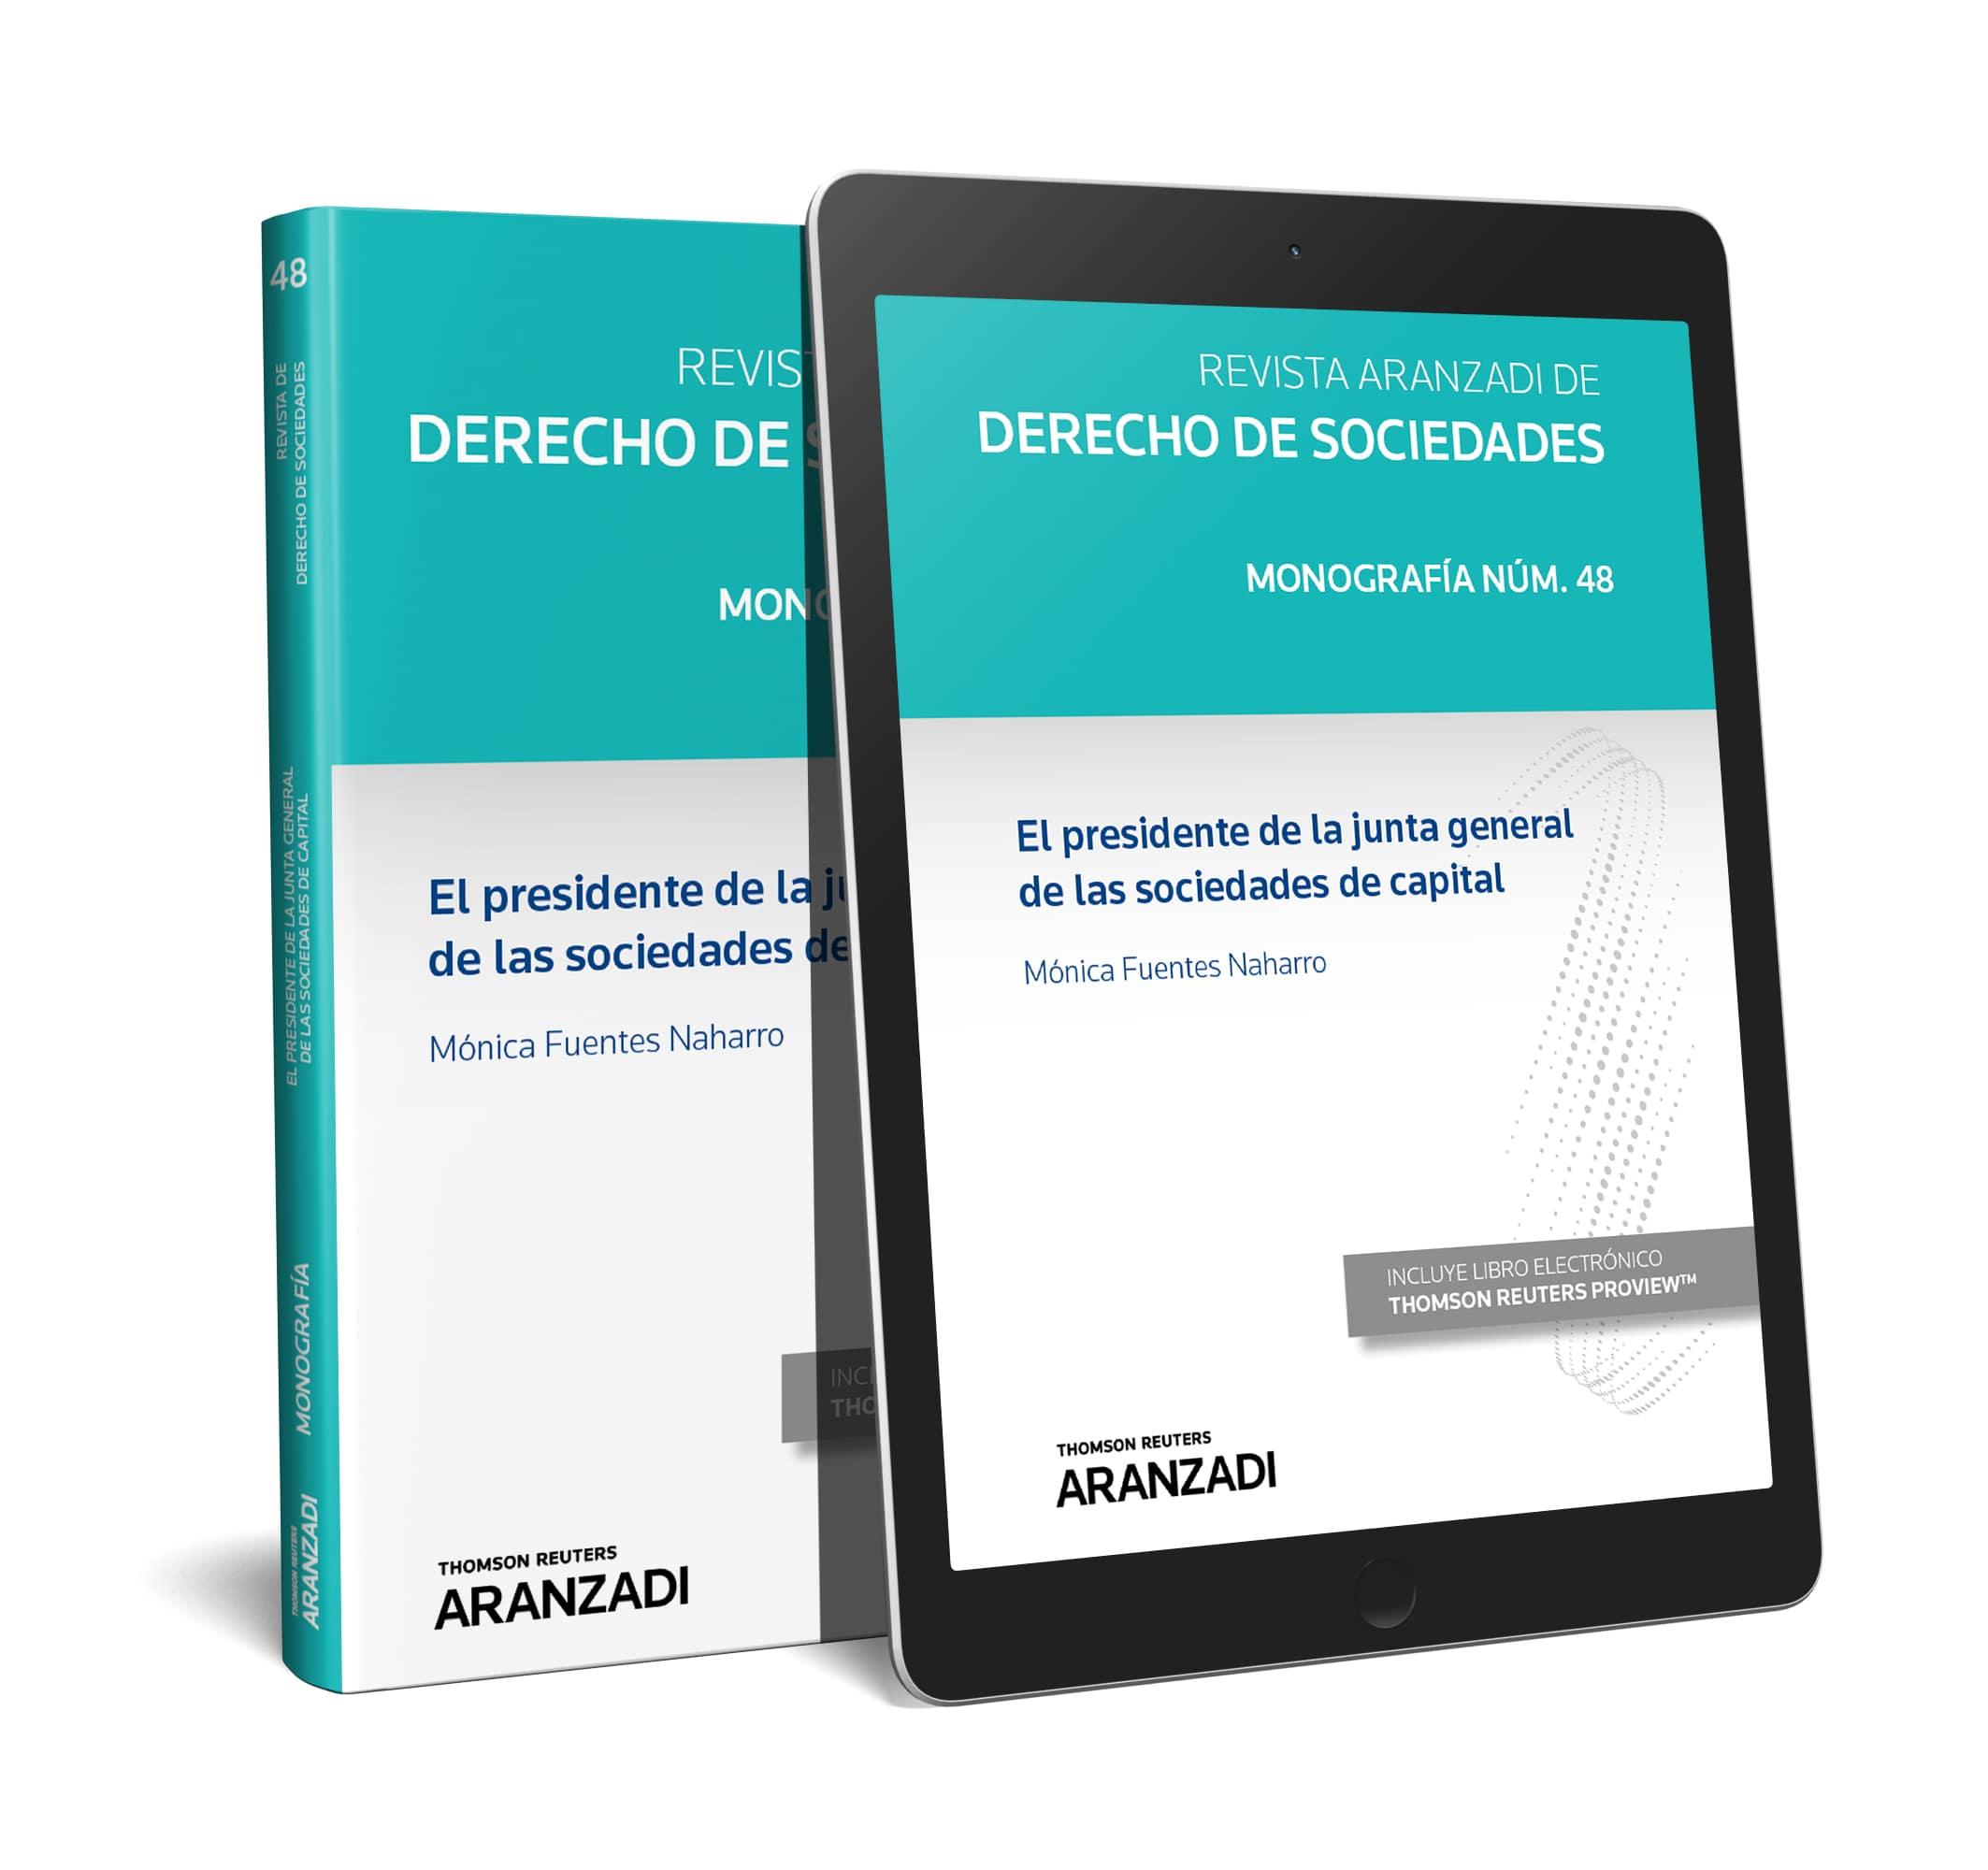 PRESIDENTE JUNTA GENEARAL SOCIEDADES CAPITAL (DÚO)